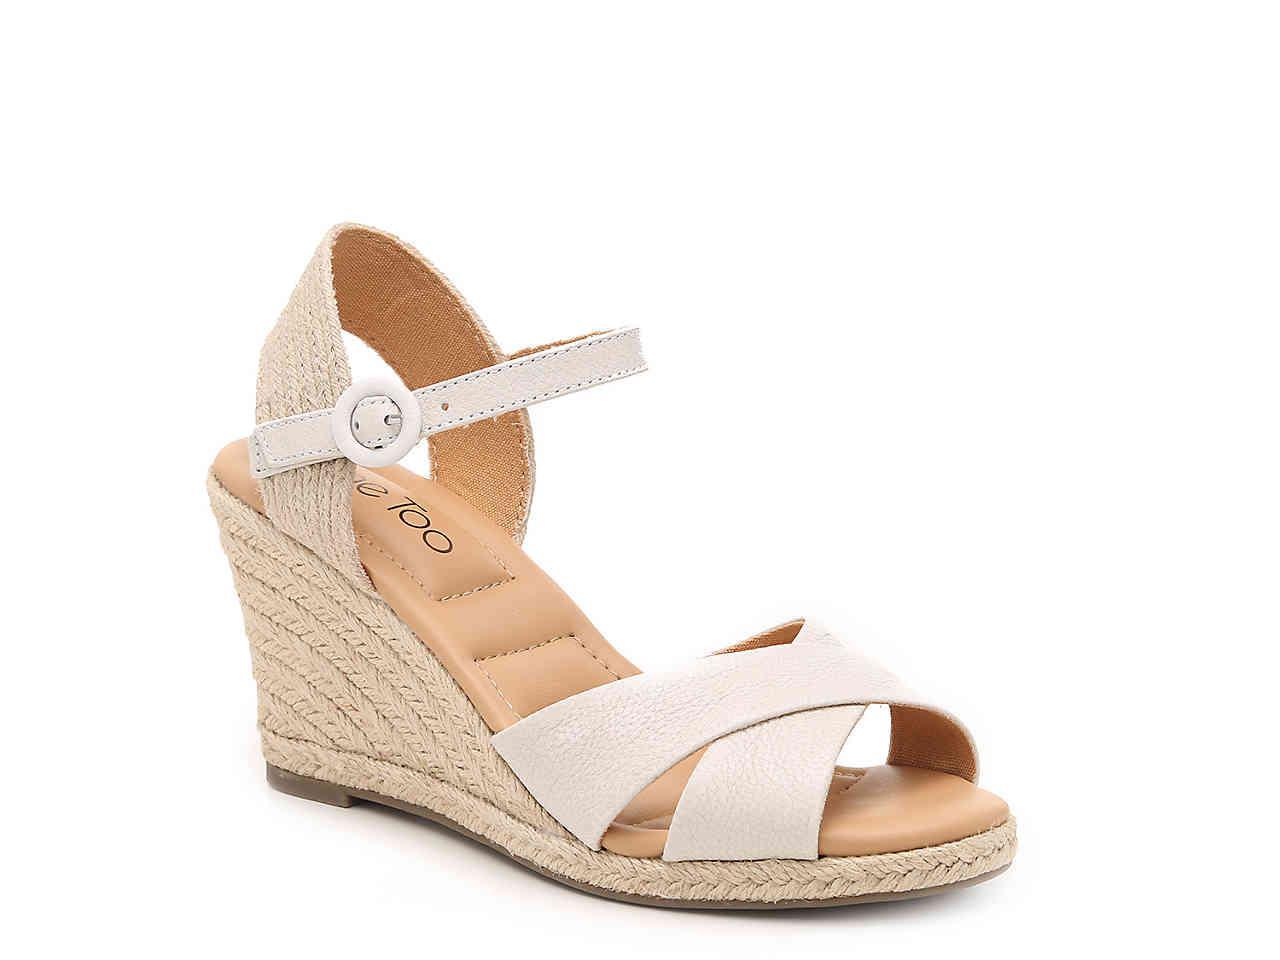 f9ae3cee104 Lyst - Me Too Bettina Espadrille Wedge Sandal in White